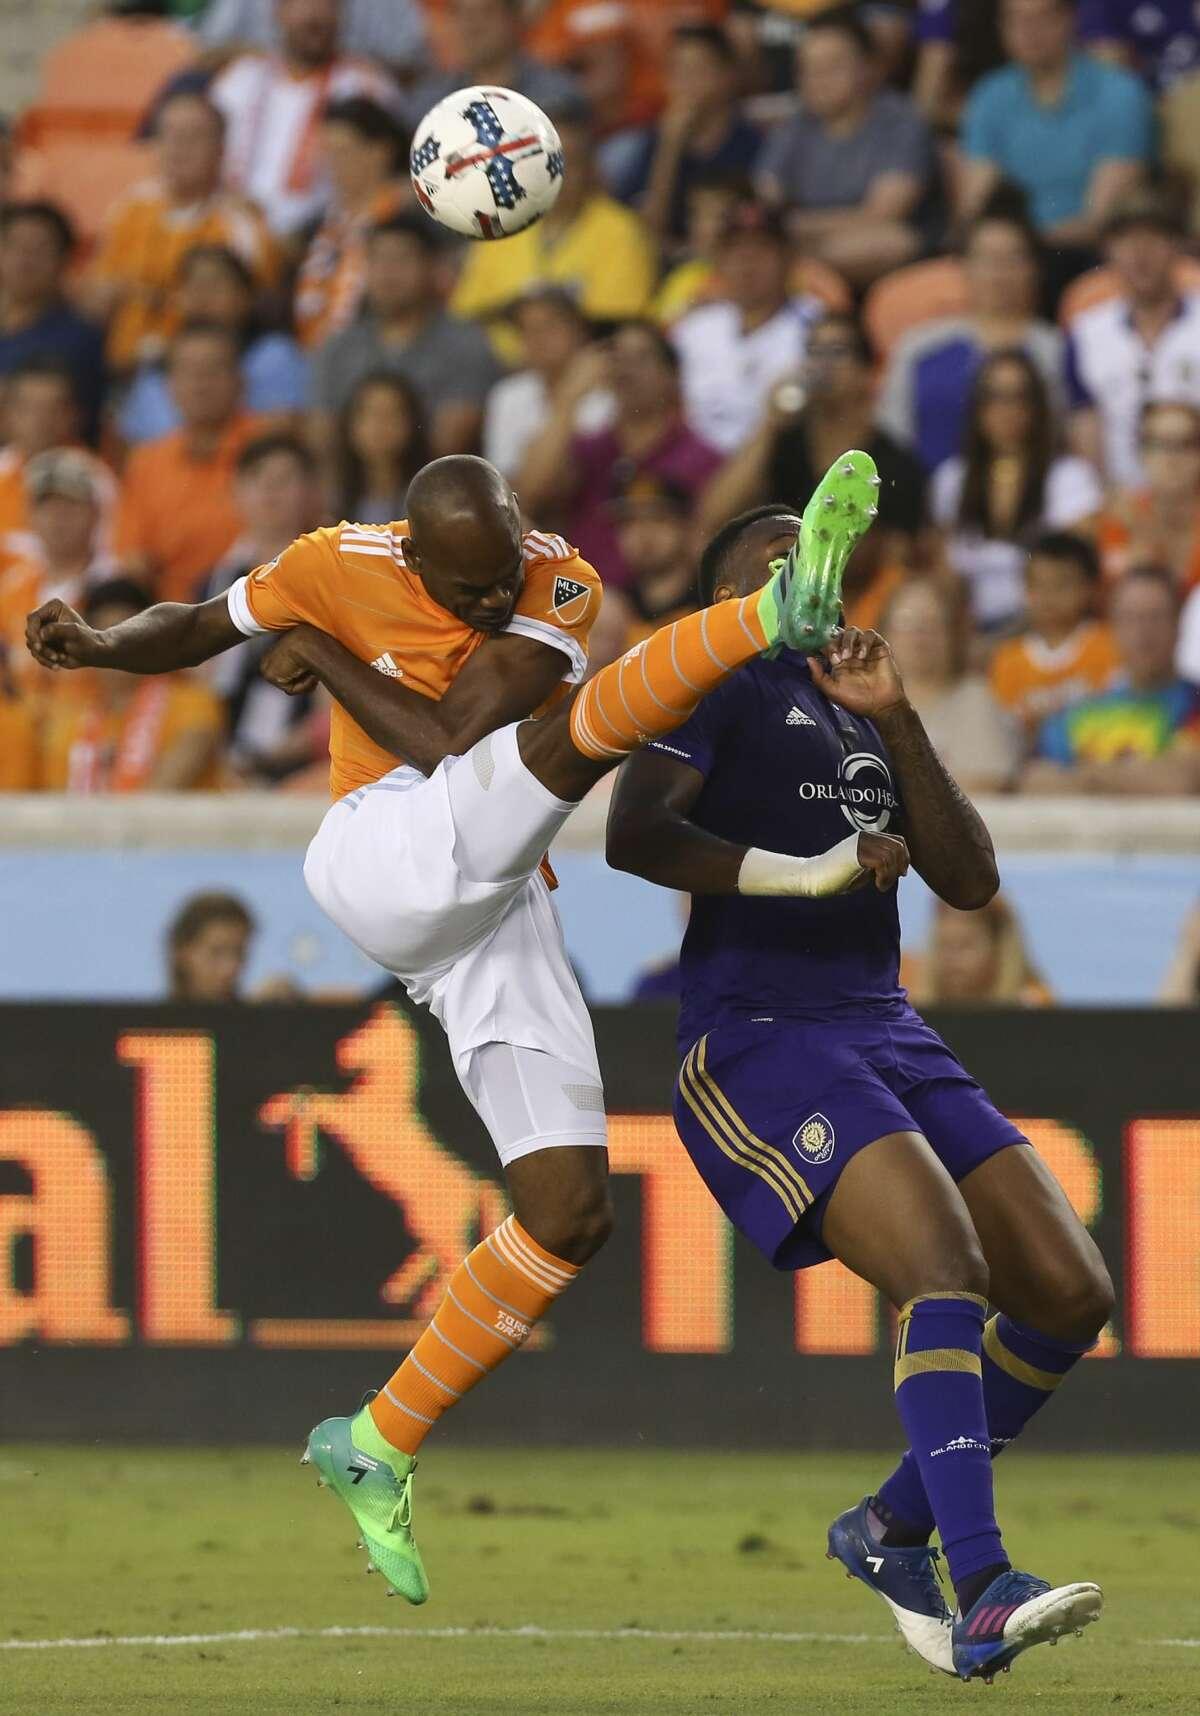 Houston Dynamo defender Adolfo Machado (3) kicks the ball away while defensing Orlando City SC forward Cyle Larin (9) during the first half of the game at BBVA Compass Stadium Saturday, May 6, 2017, in Houston. ( Yi-Chin Lee / Houston Chronicle )